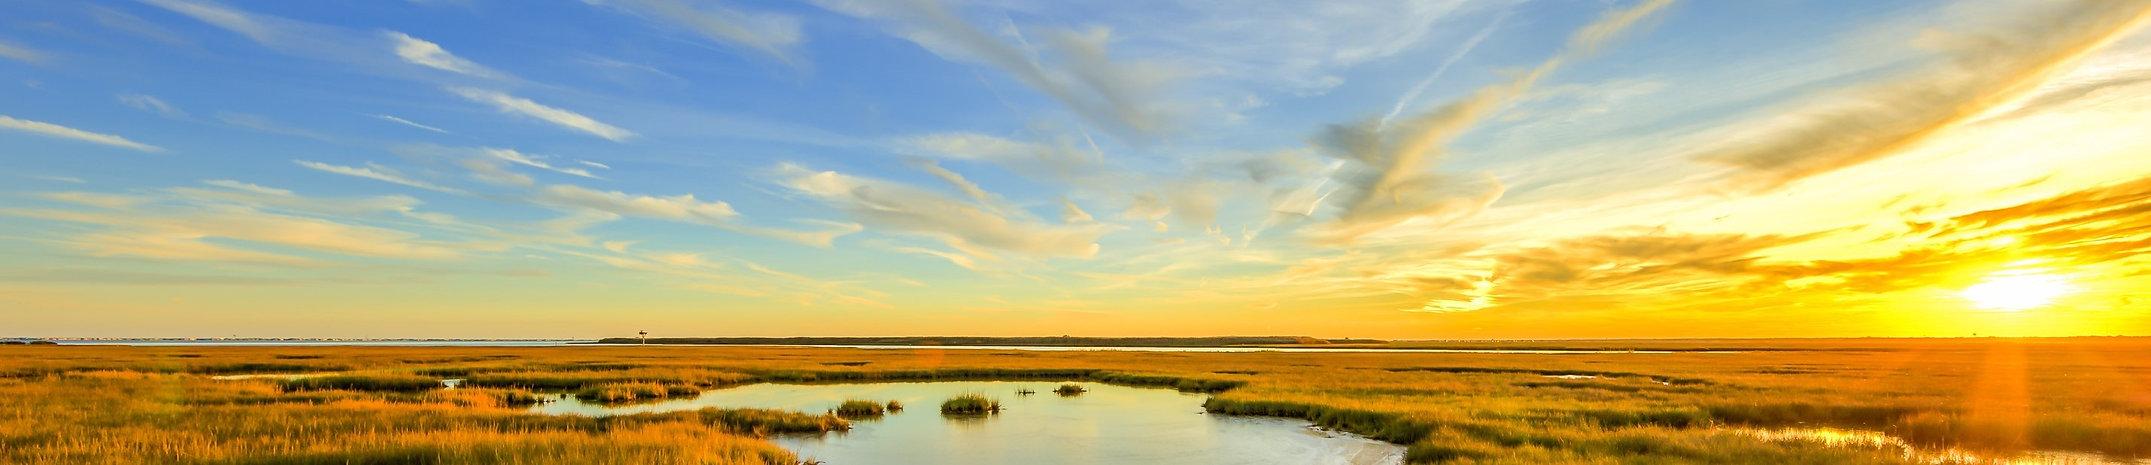 Marsh 2 b.jpg